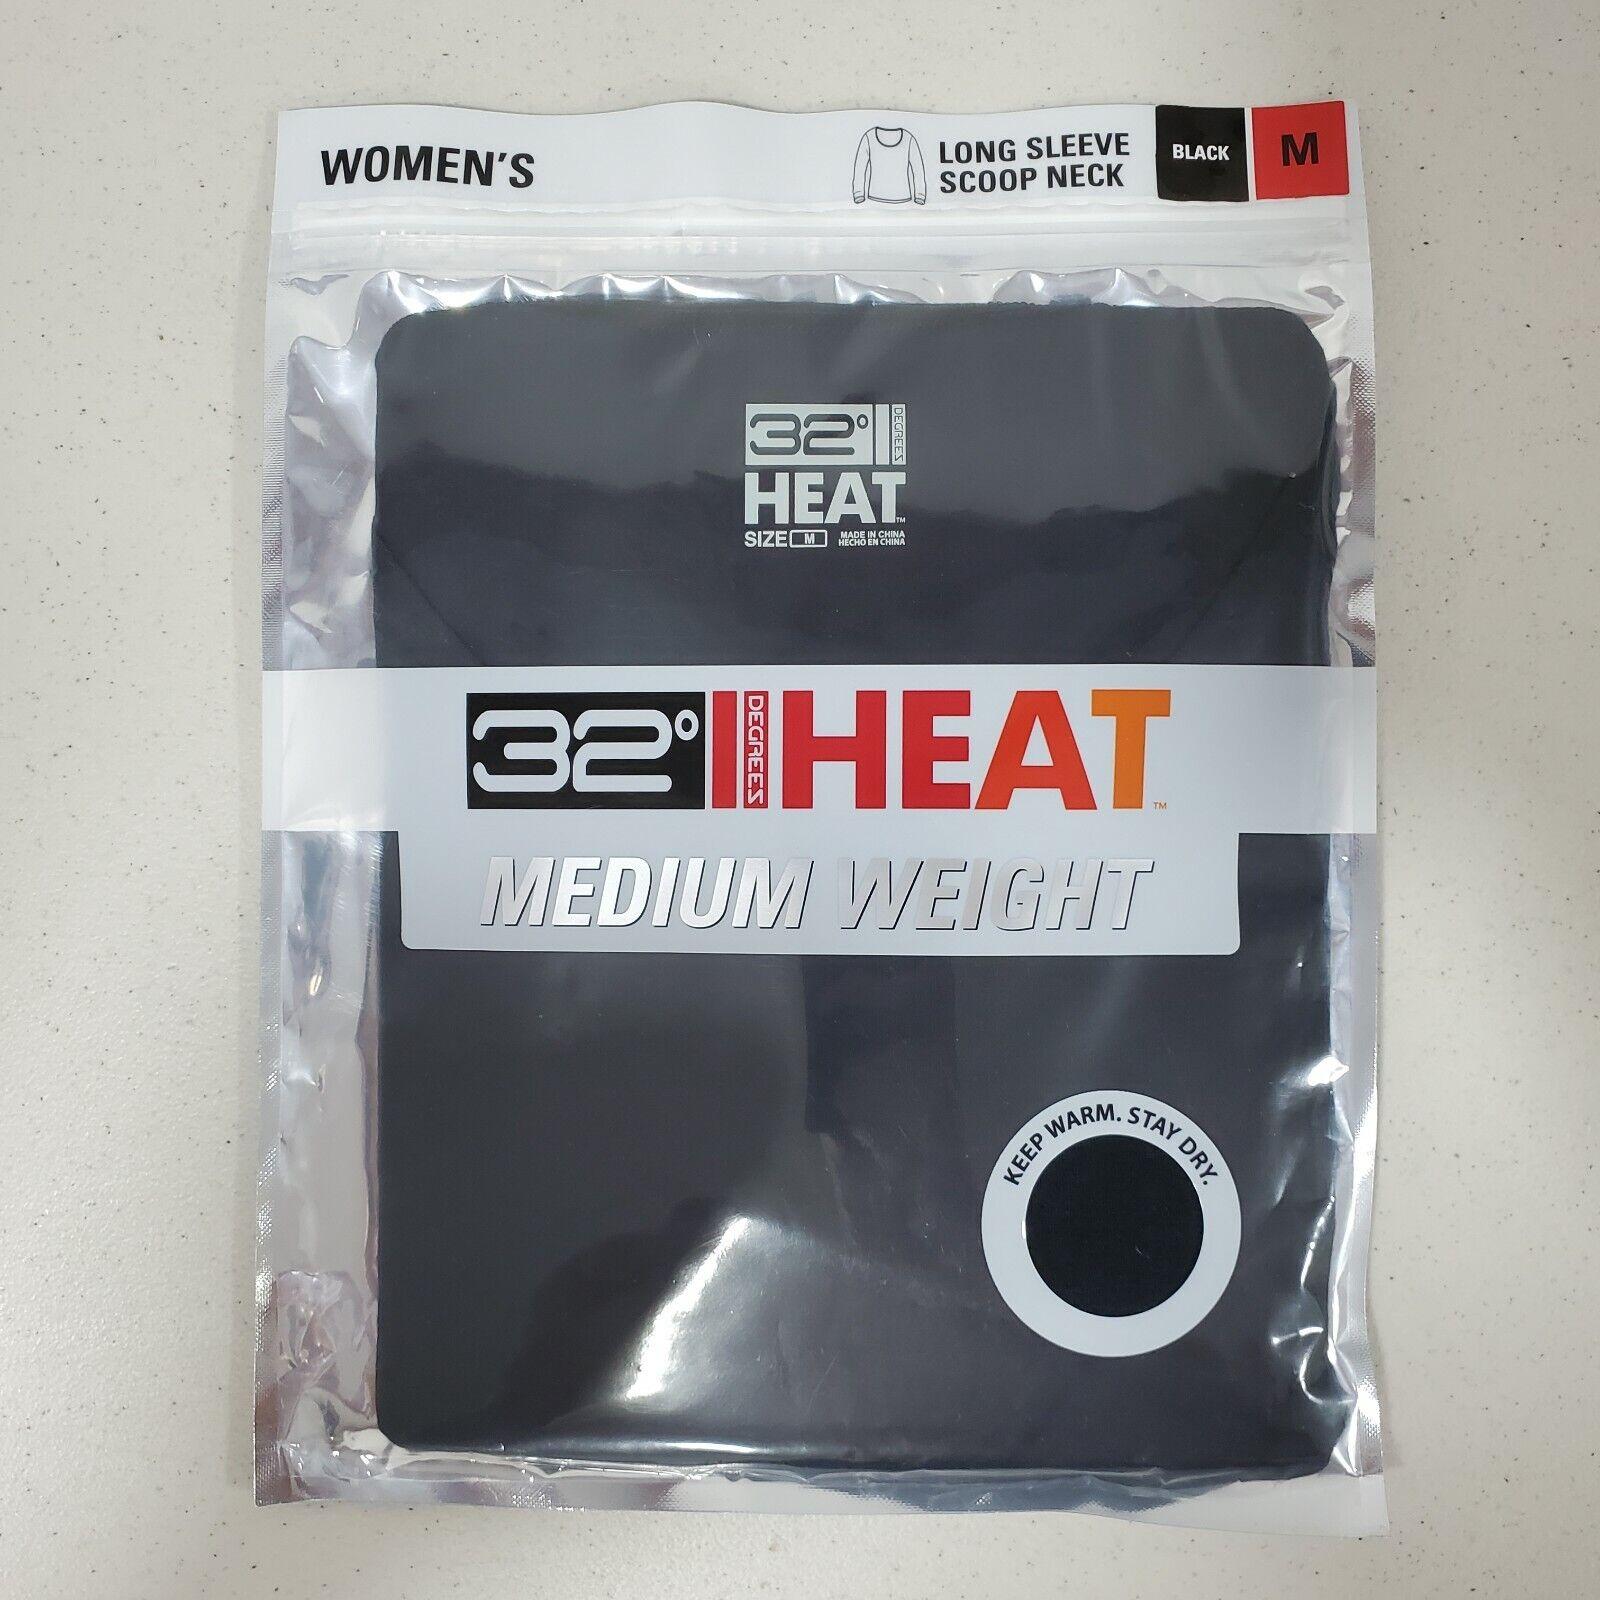 Women's 32 Degrees Heat Black Long Sleeve Scoop Neck Size Medium Free Shipping